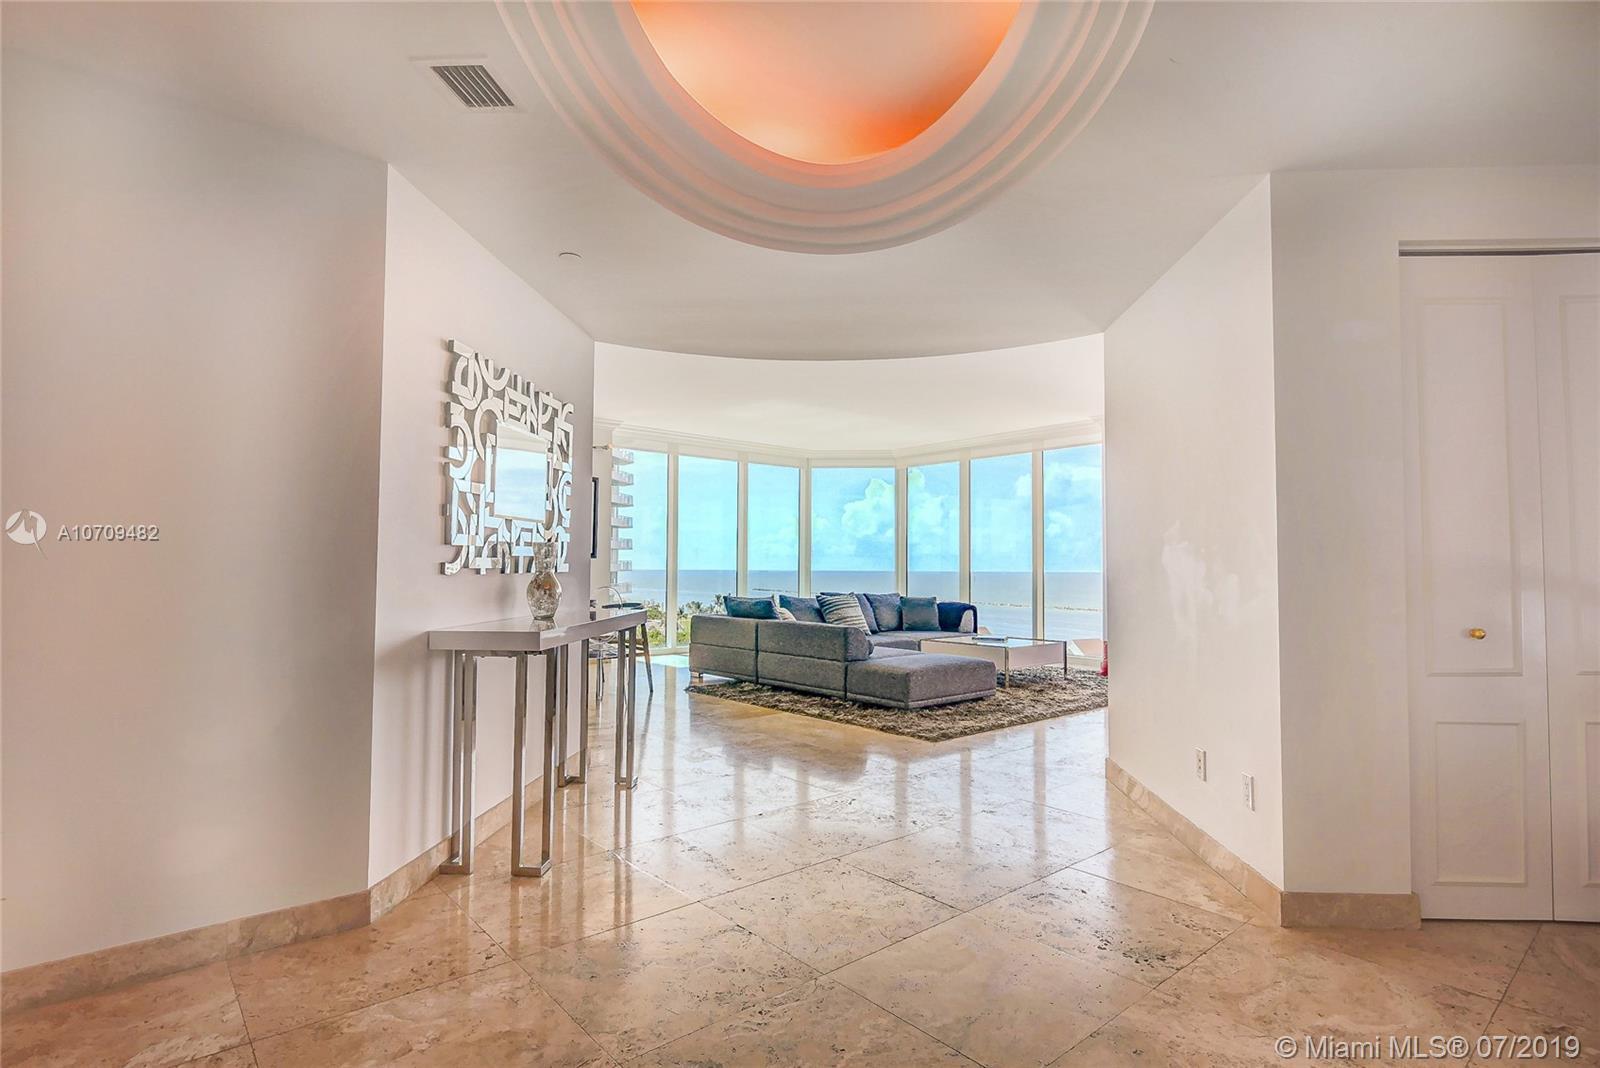 300 S Pointe Dr, 1001 - Miami Beach, Florida